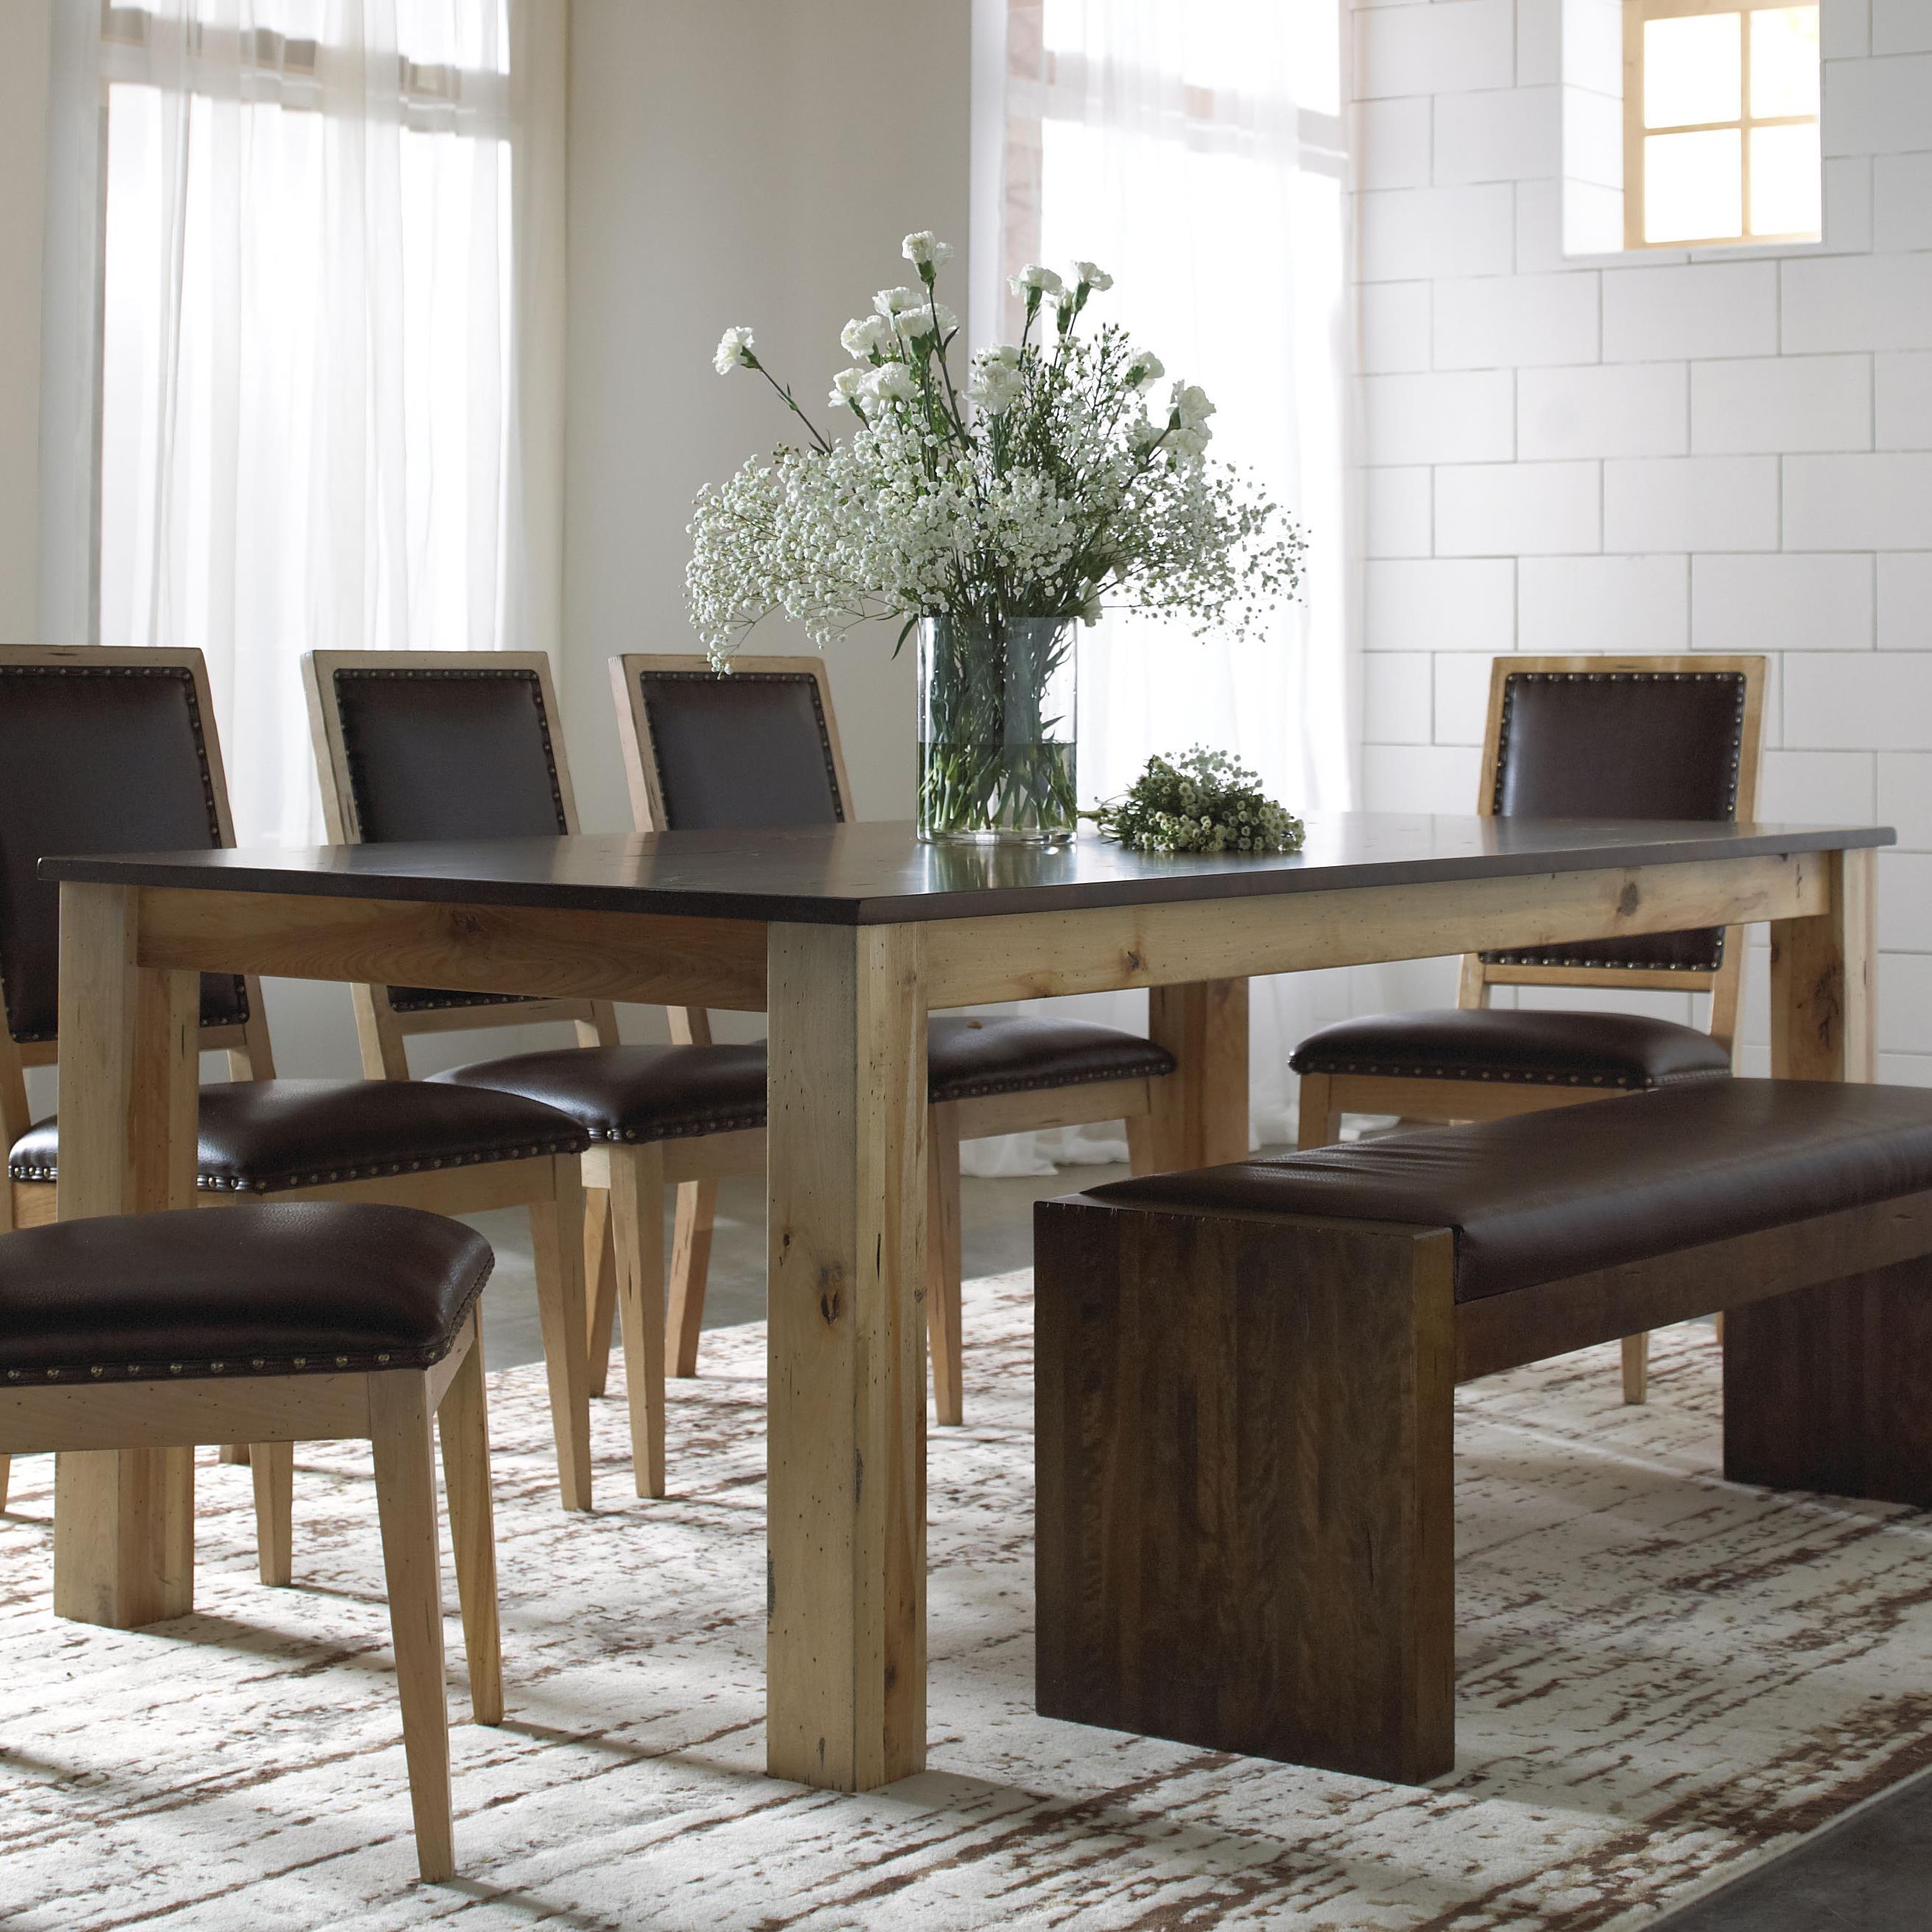 Canadel Loft - Custom Dining <b>Customizable</b> Rectangular Table - Item Number: TRE042801902RHMJF